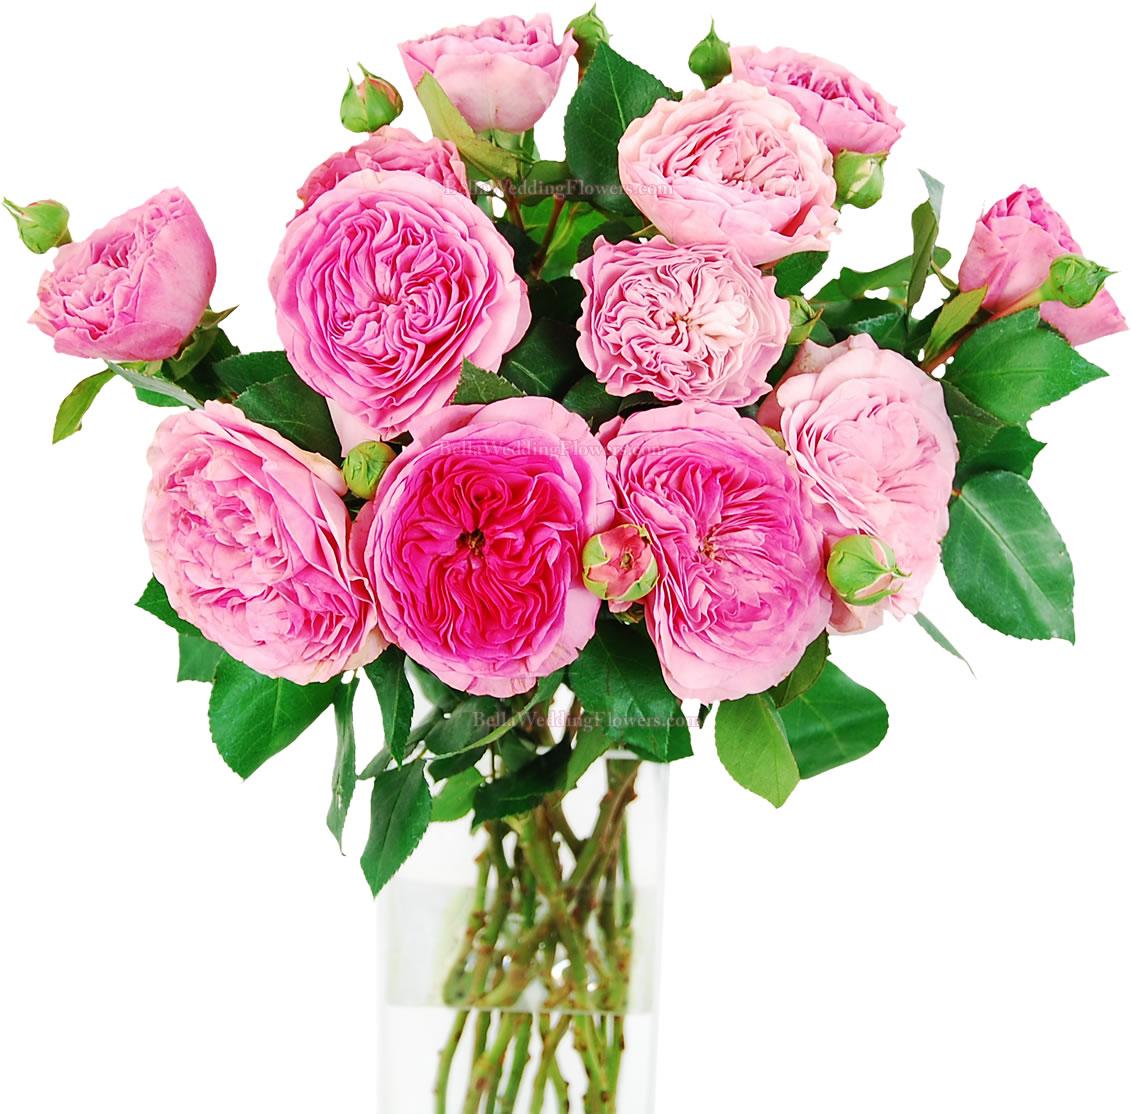 Pink Baroness Garden RosesA Beautiful Pink Garden Rose!